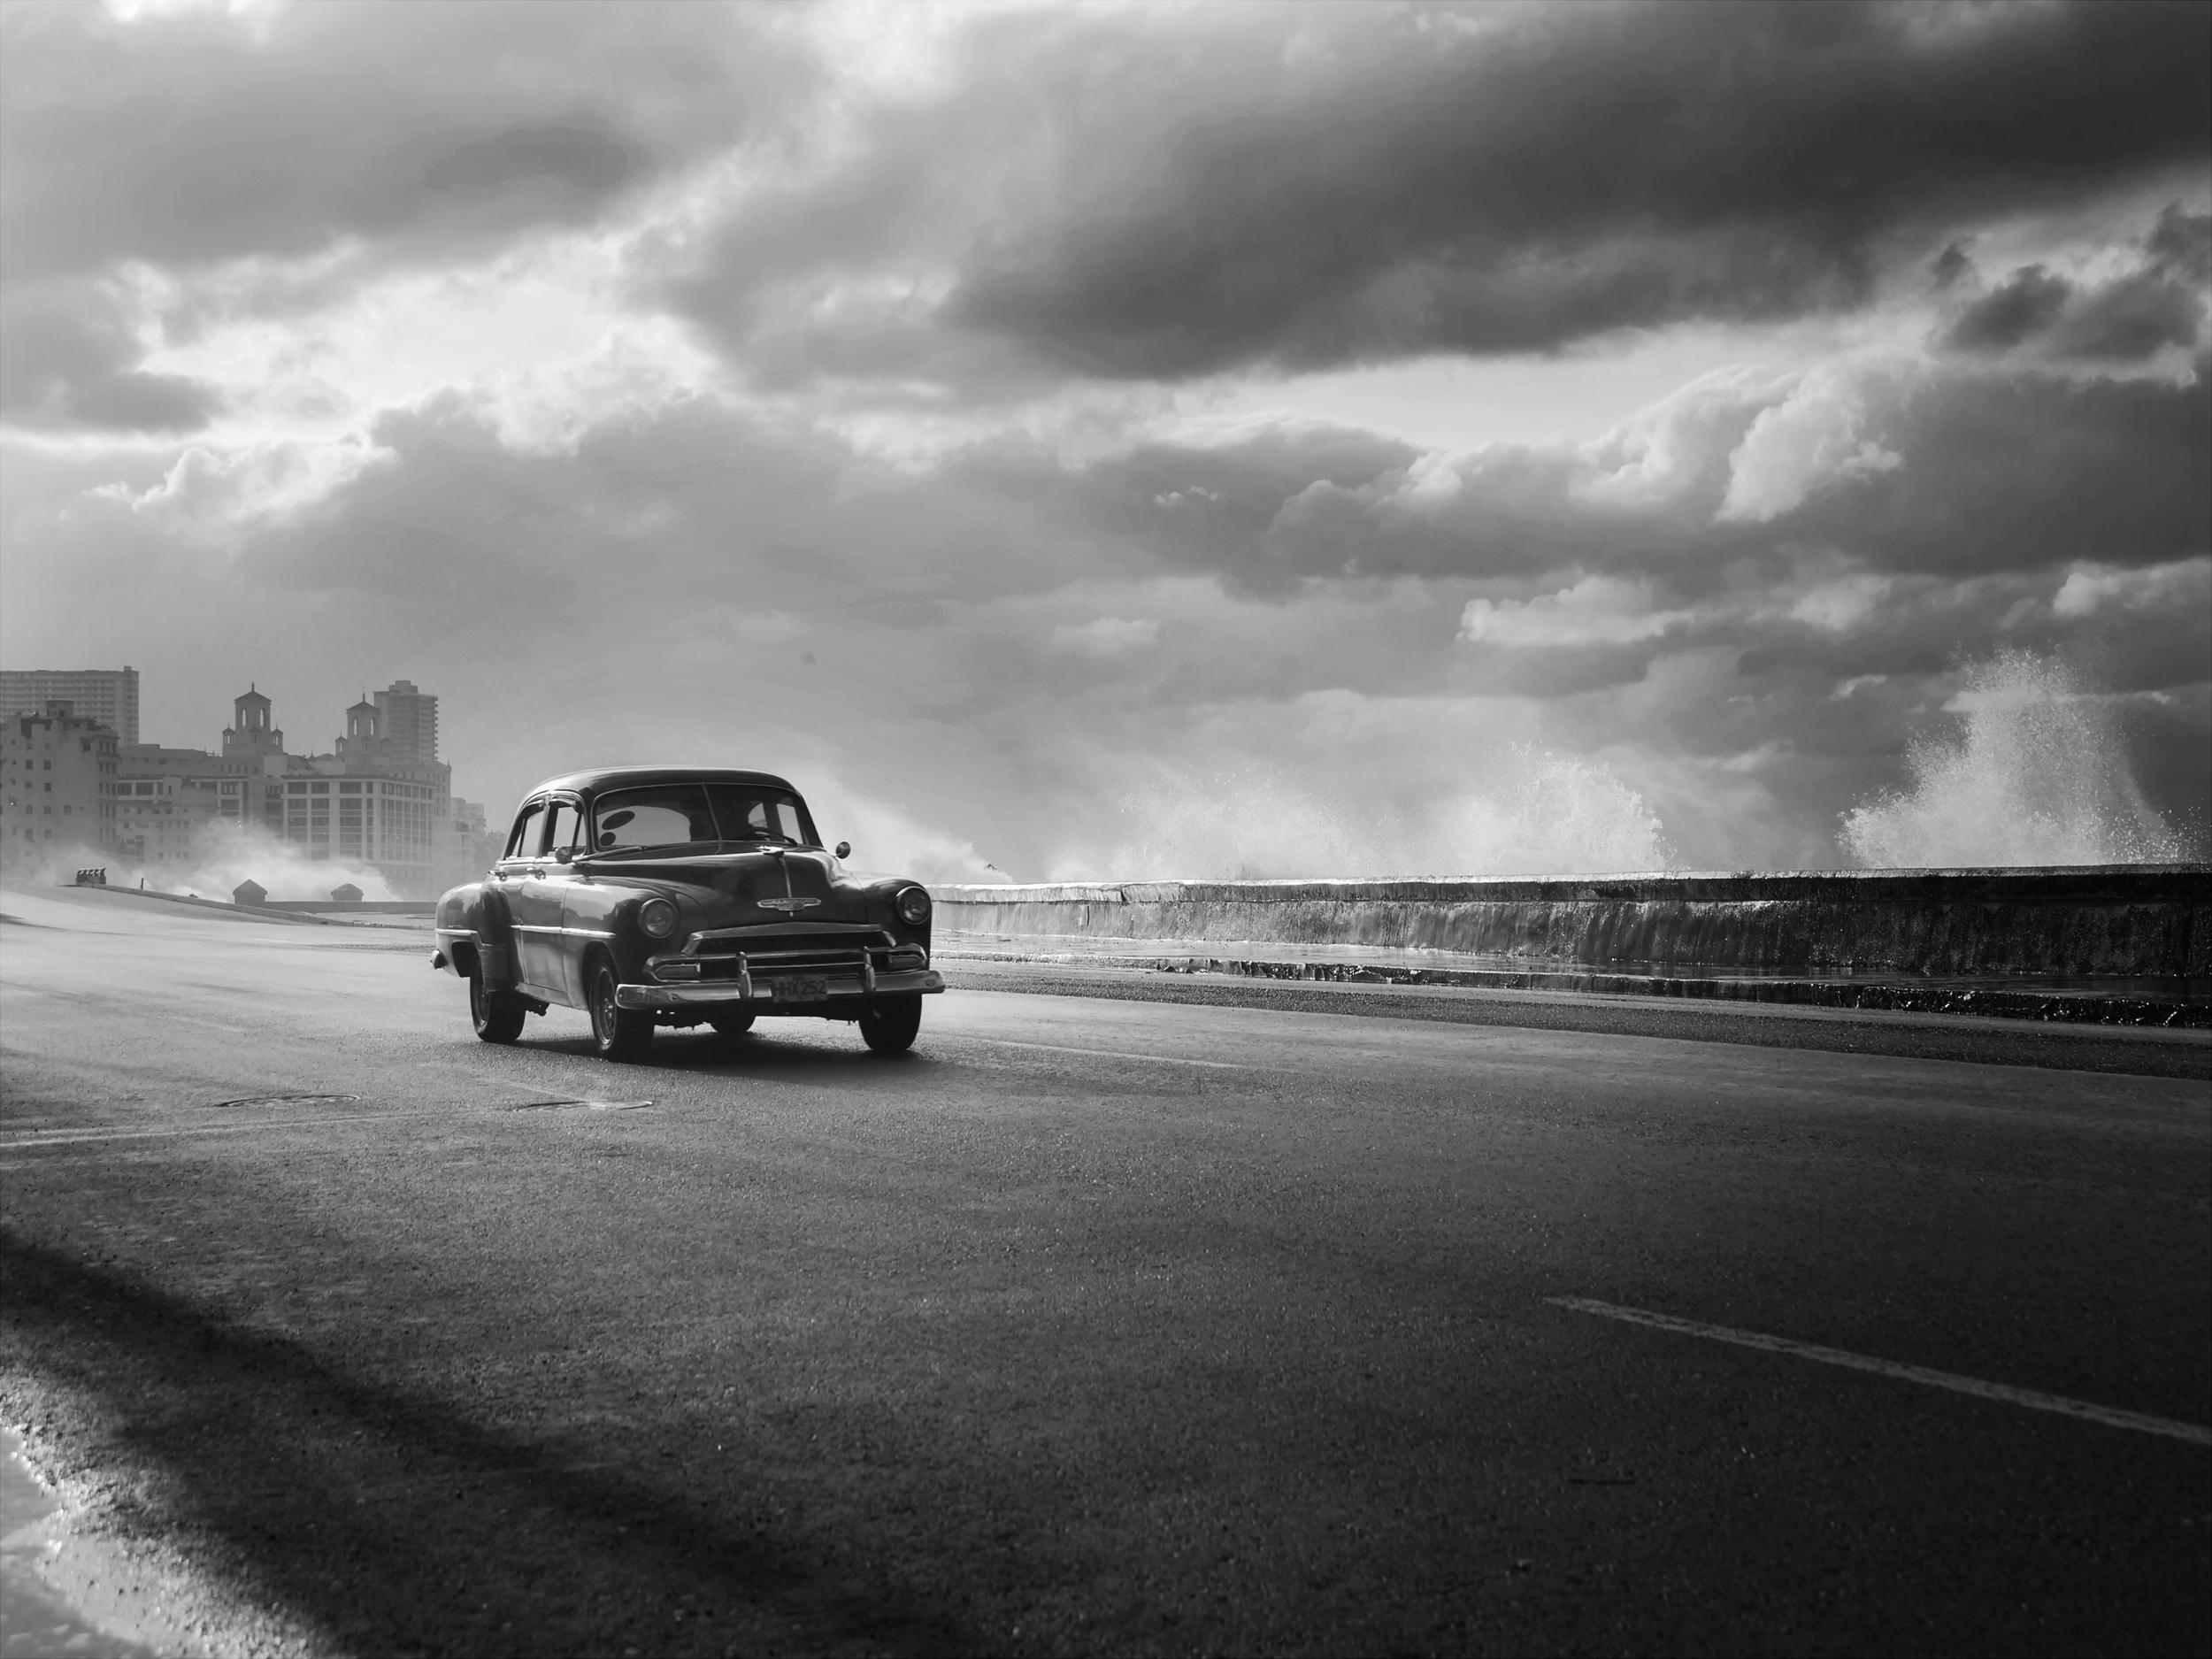 Cuba Macchina.jpg